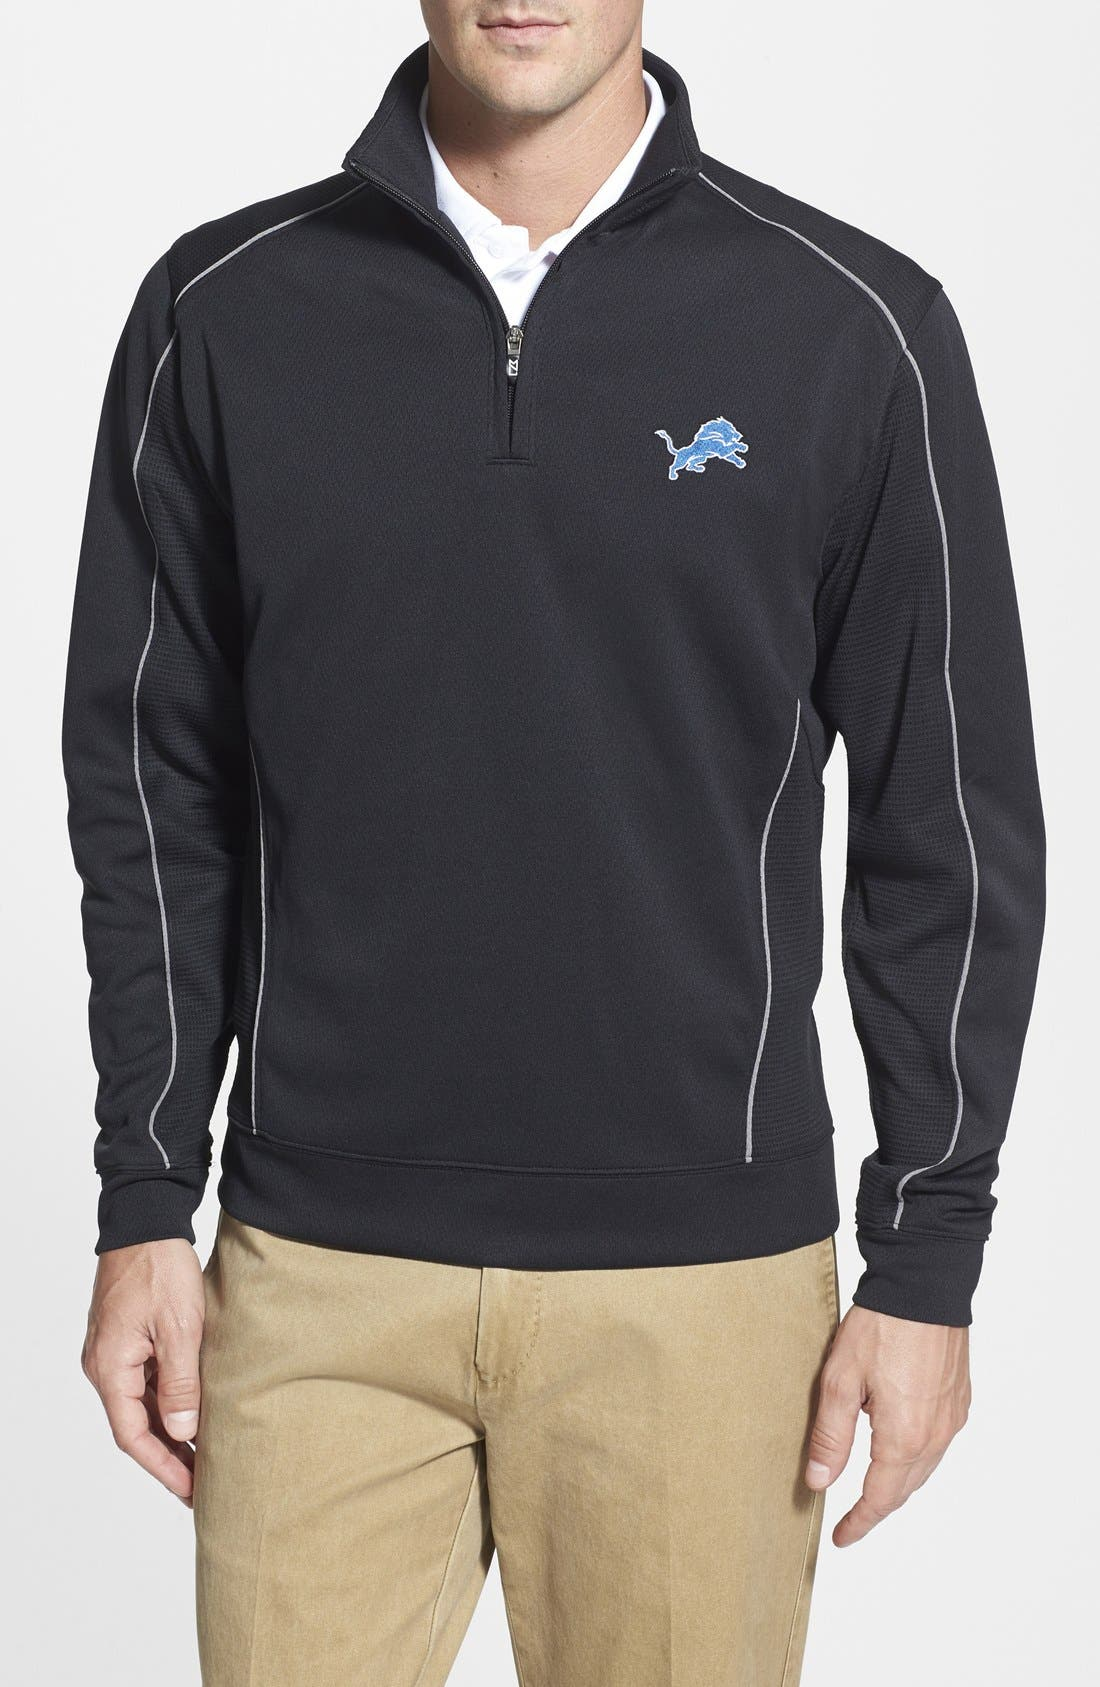 Detroit Lions - Edge DryTec Moisture Wicking Half Zip Pullover,                         Main,                         color, Black